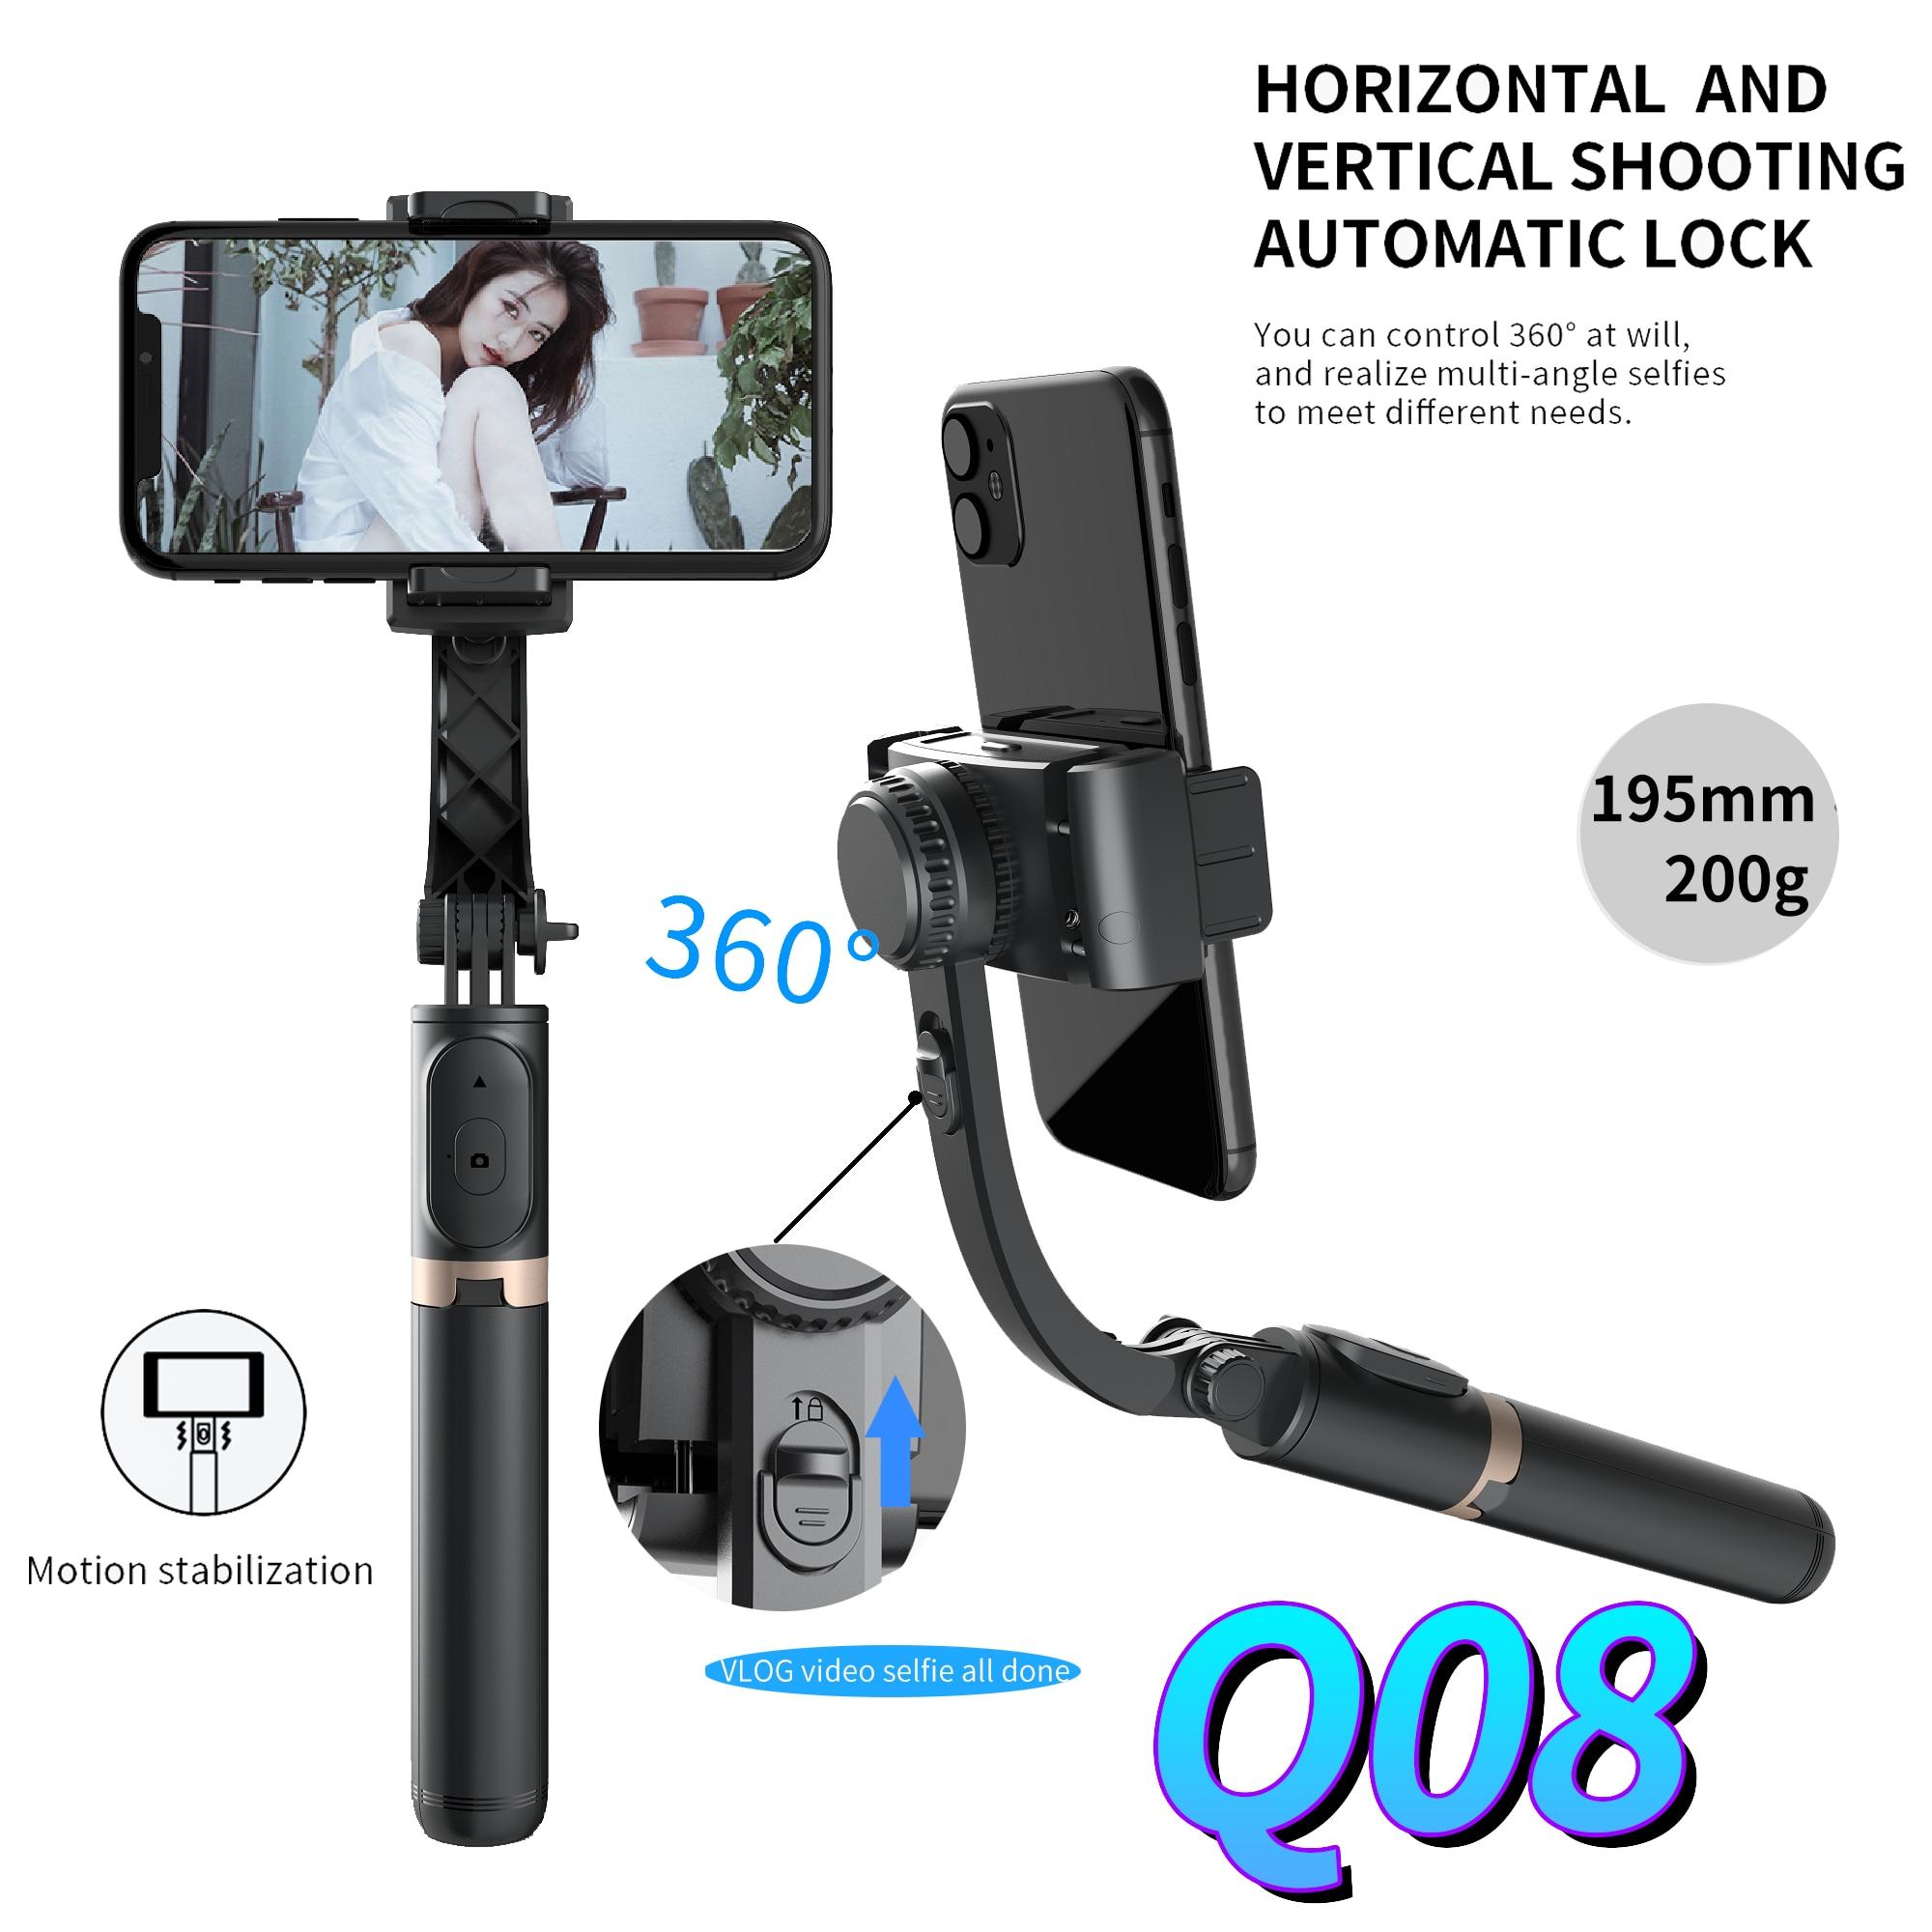 FANGUOTSI 2021 New Bluetooth handheld gimbal stabilizer selfie stick expandable handheld monopod mini tripod For Android IOS